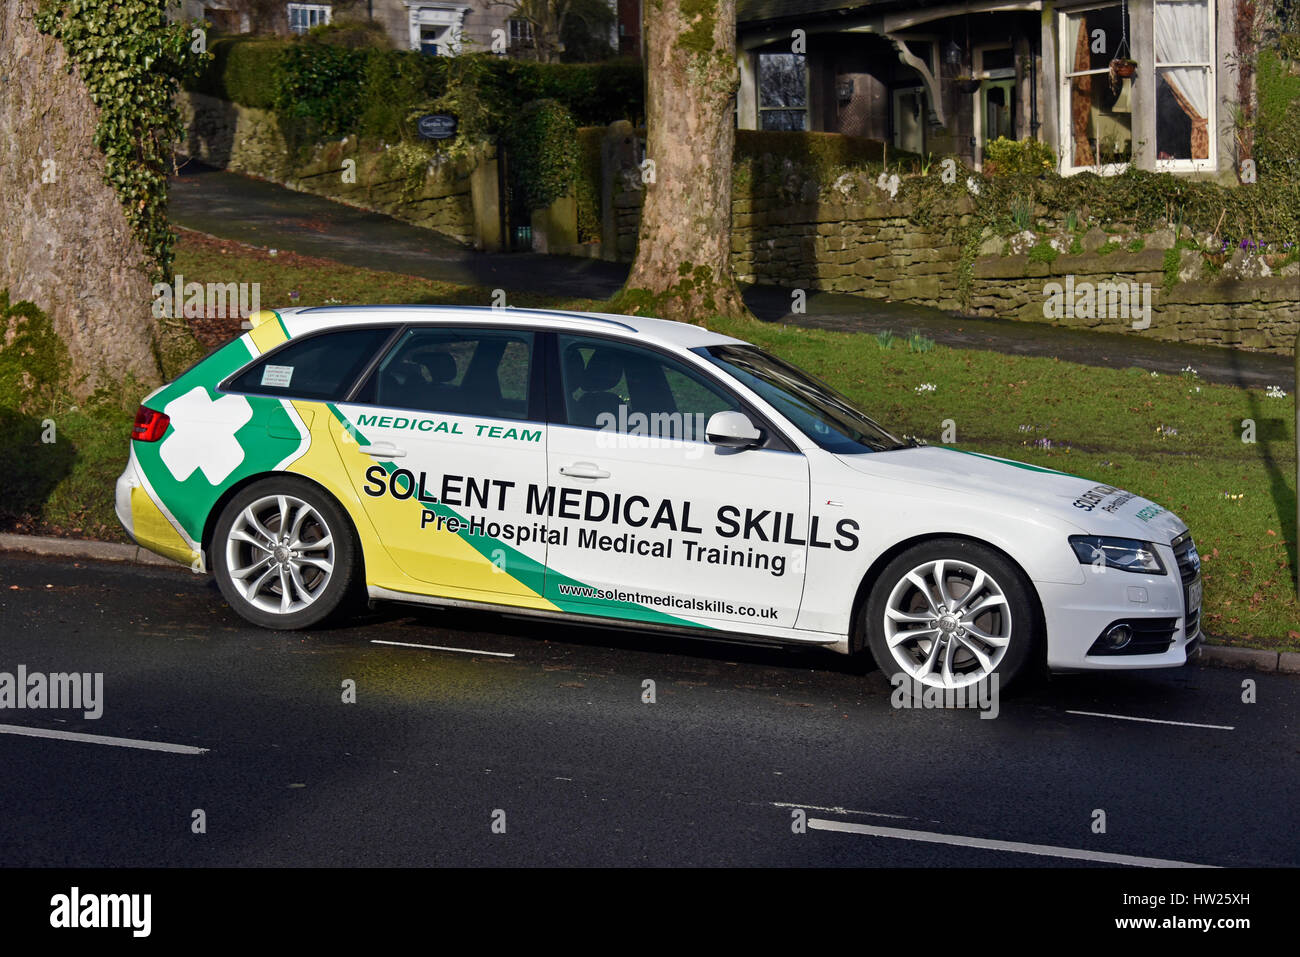 Solent Medical Skills, Pre-Hospital Medical Training, medical team motor vehicle. Beast Banks, Kendal, Cumbria, - Stock Image